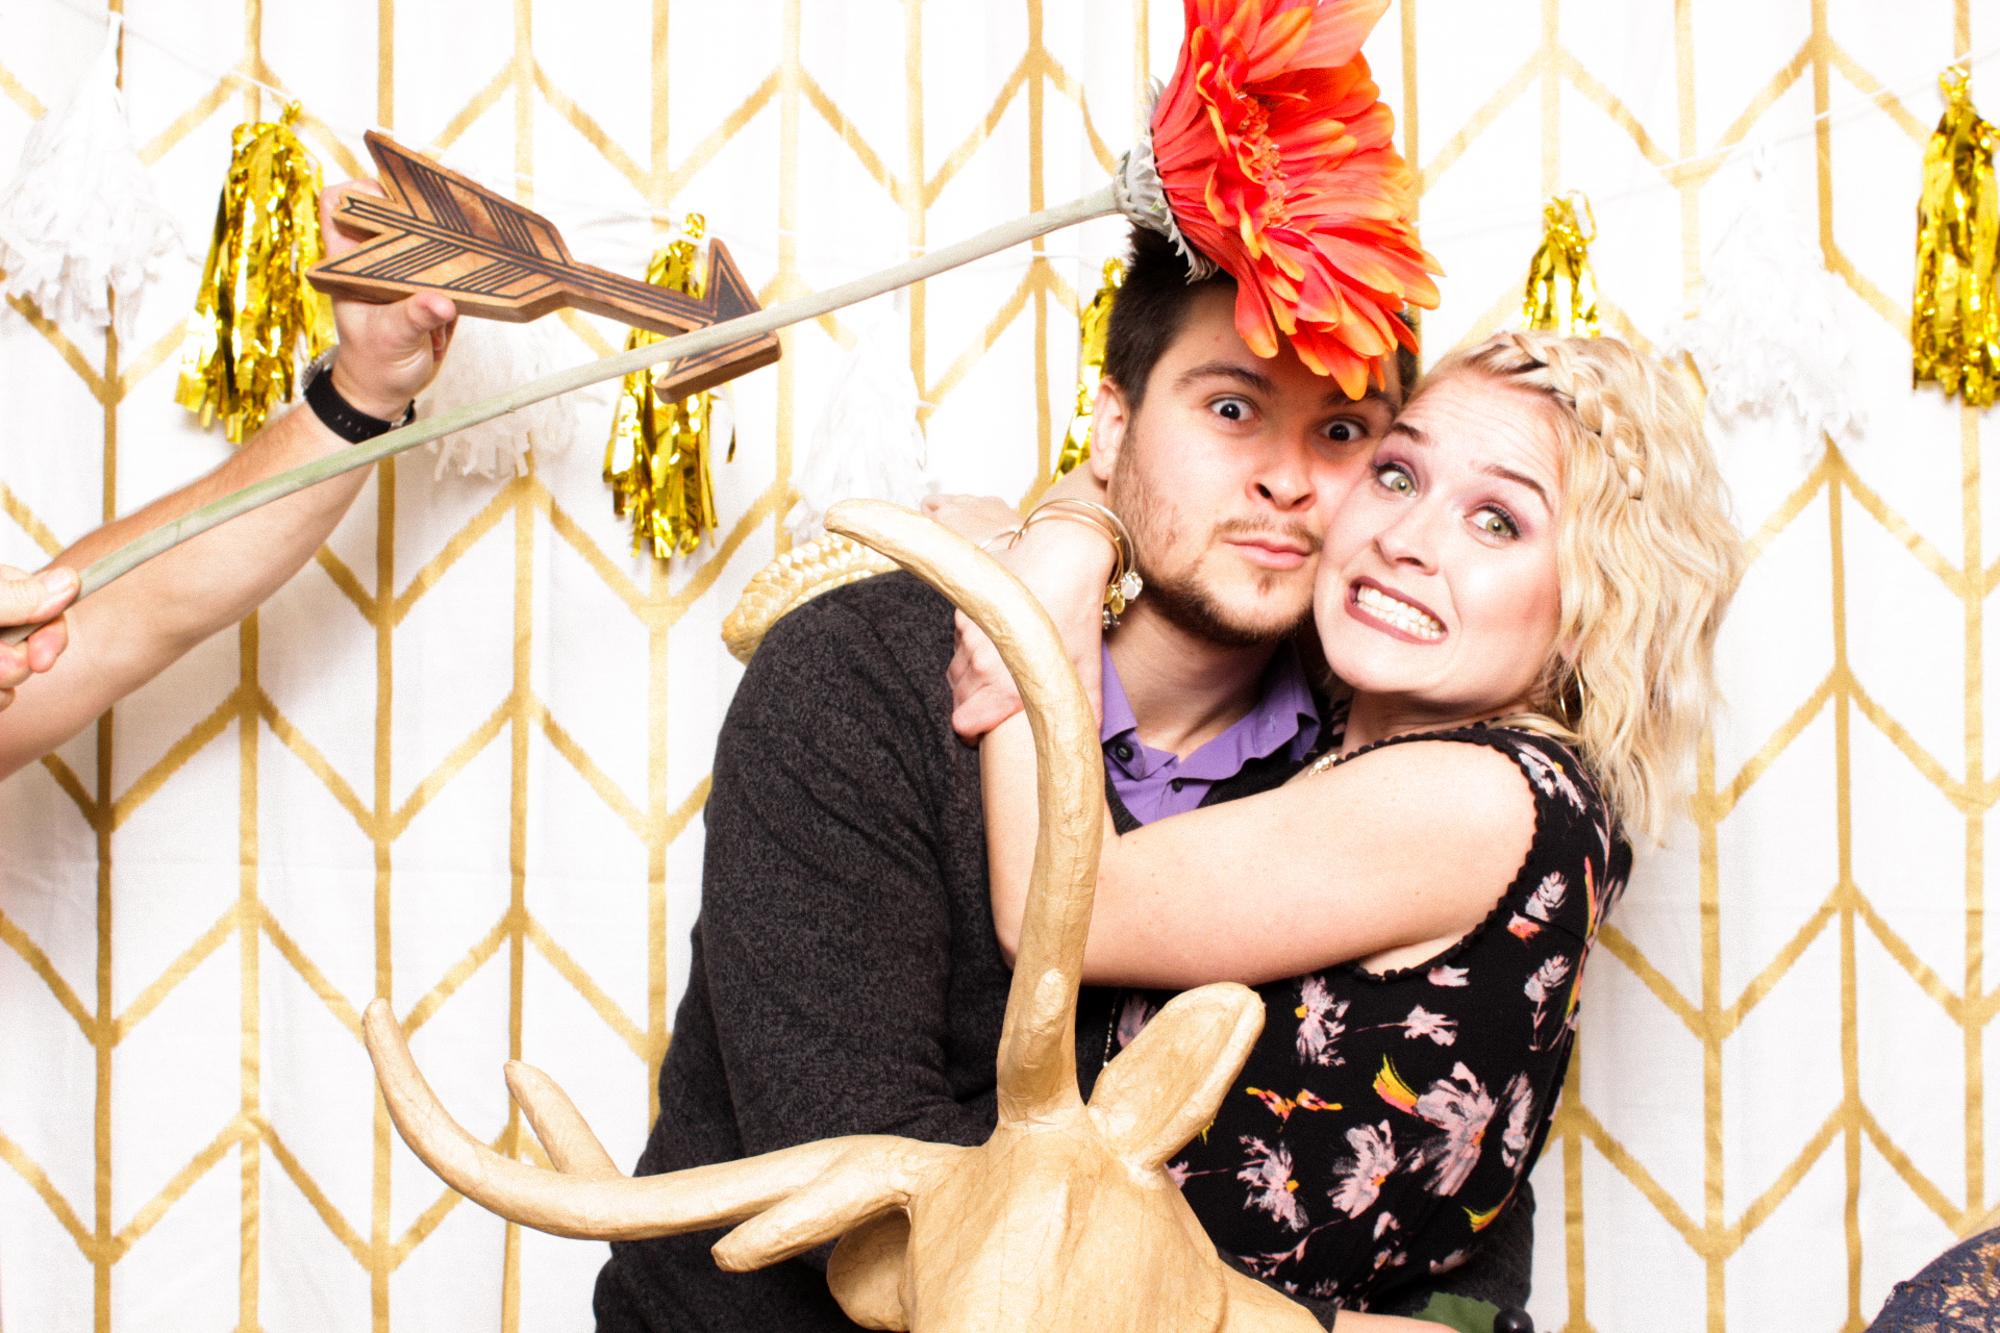 The_Reverie_Booth-Naples_Photobooth-Florida_Photobooth_Rental-Wedding_Photobooth-011.jpg